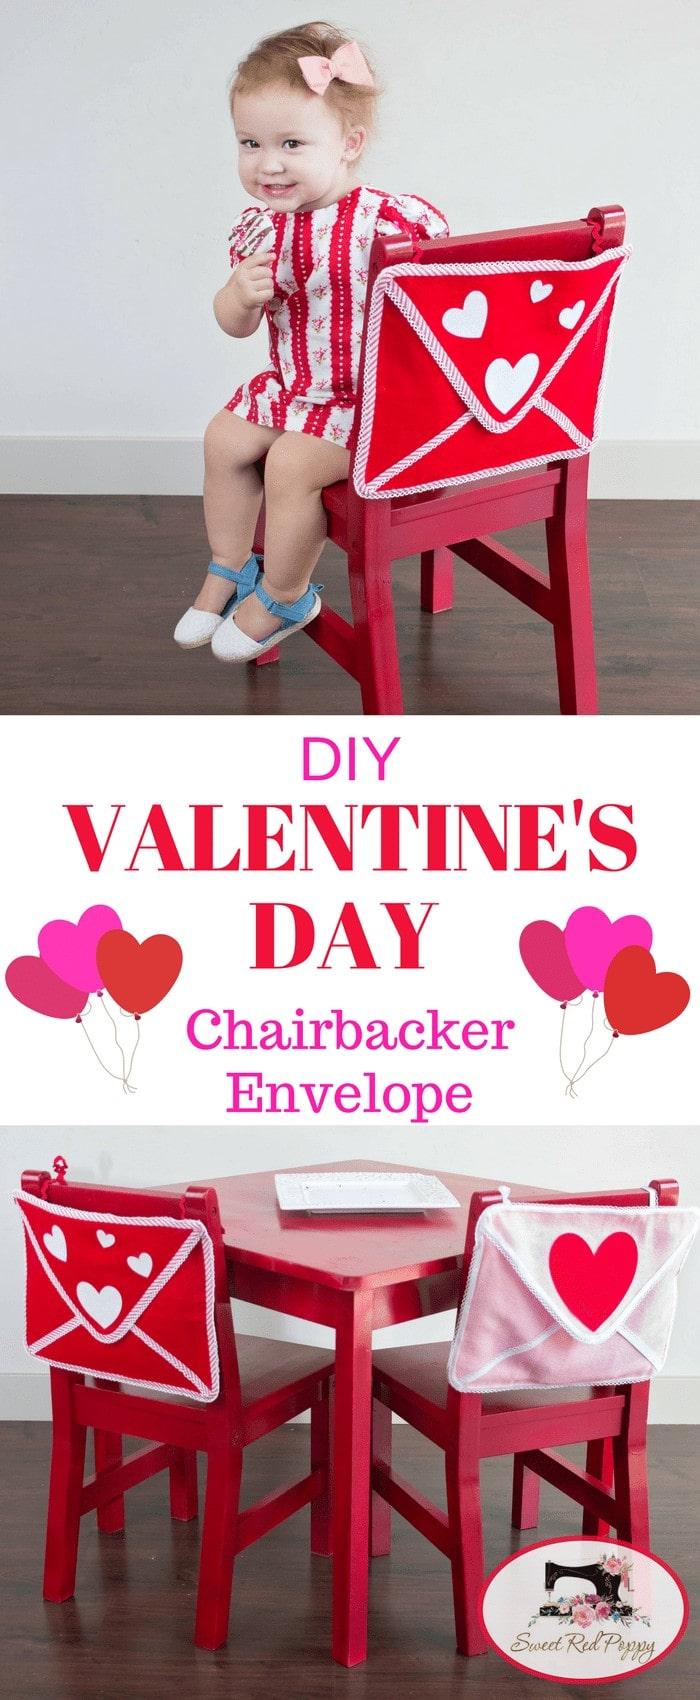 VAlentine's Day Chair Backer Envelope Tutorial Pottery Barn Inspired